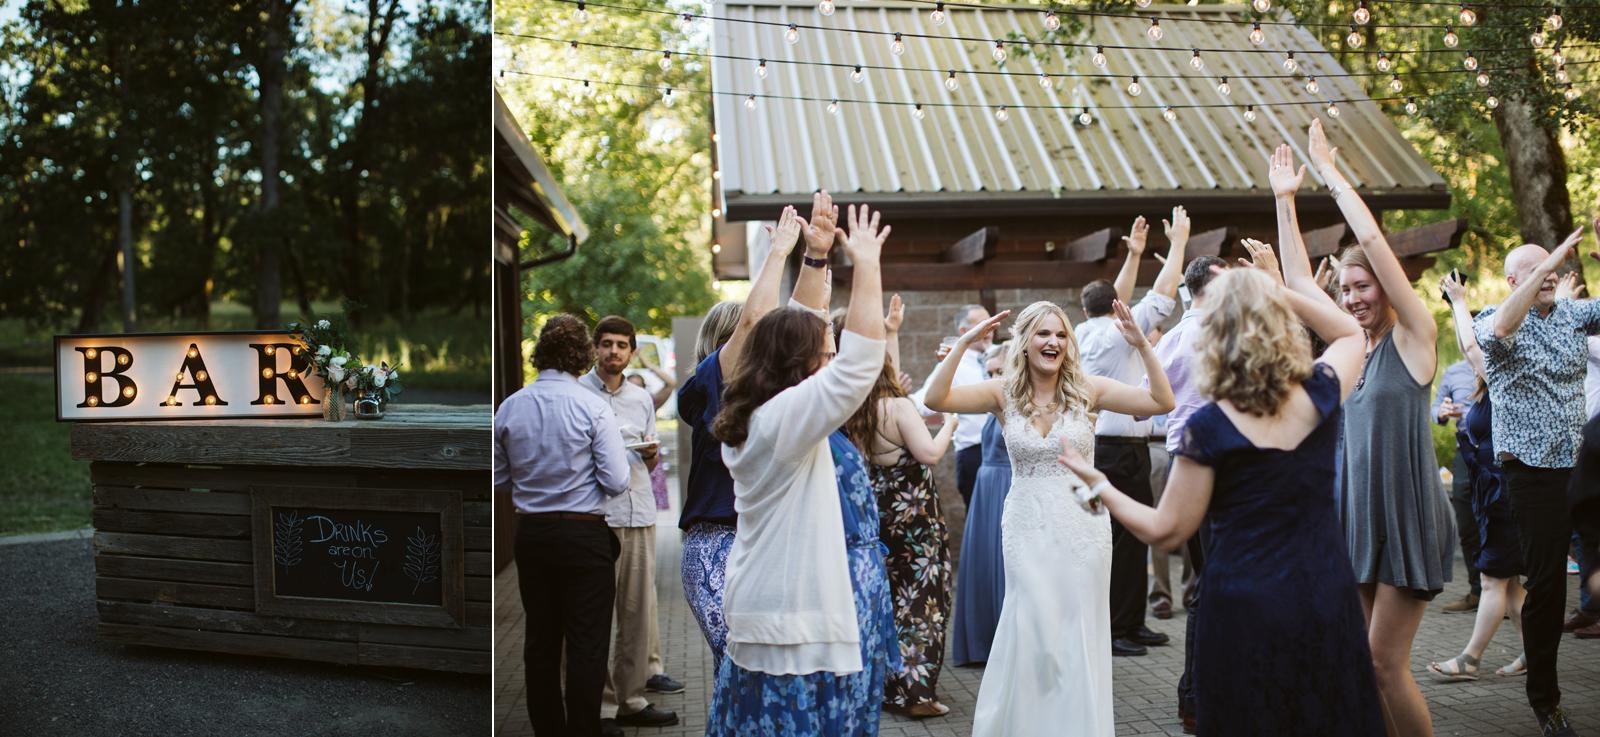 116-daronjackson-rachel-michael-wedding-mtpisgah.jpg